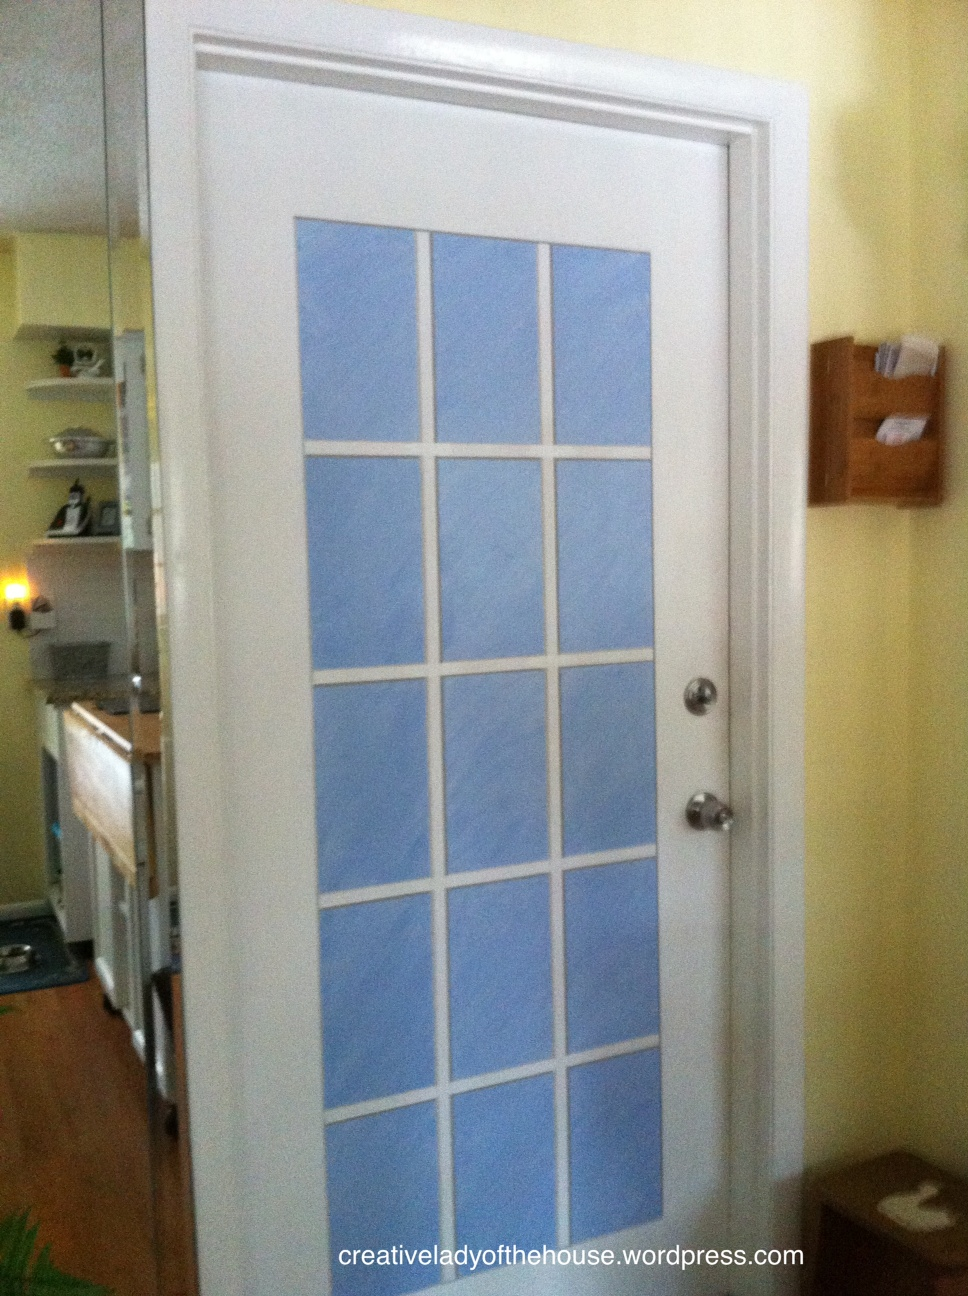 single hinged patio doors. French Interior Doors, Wood And Prehung Doors Single Hinged Patio